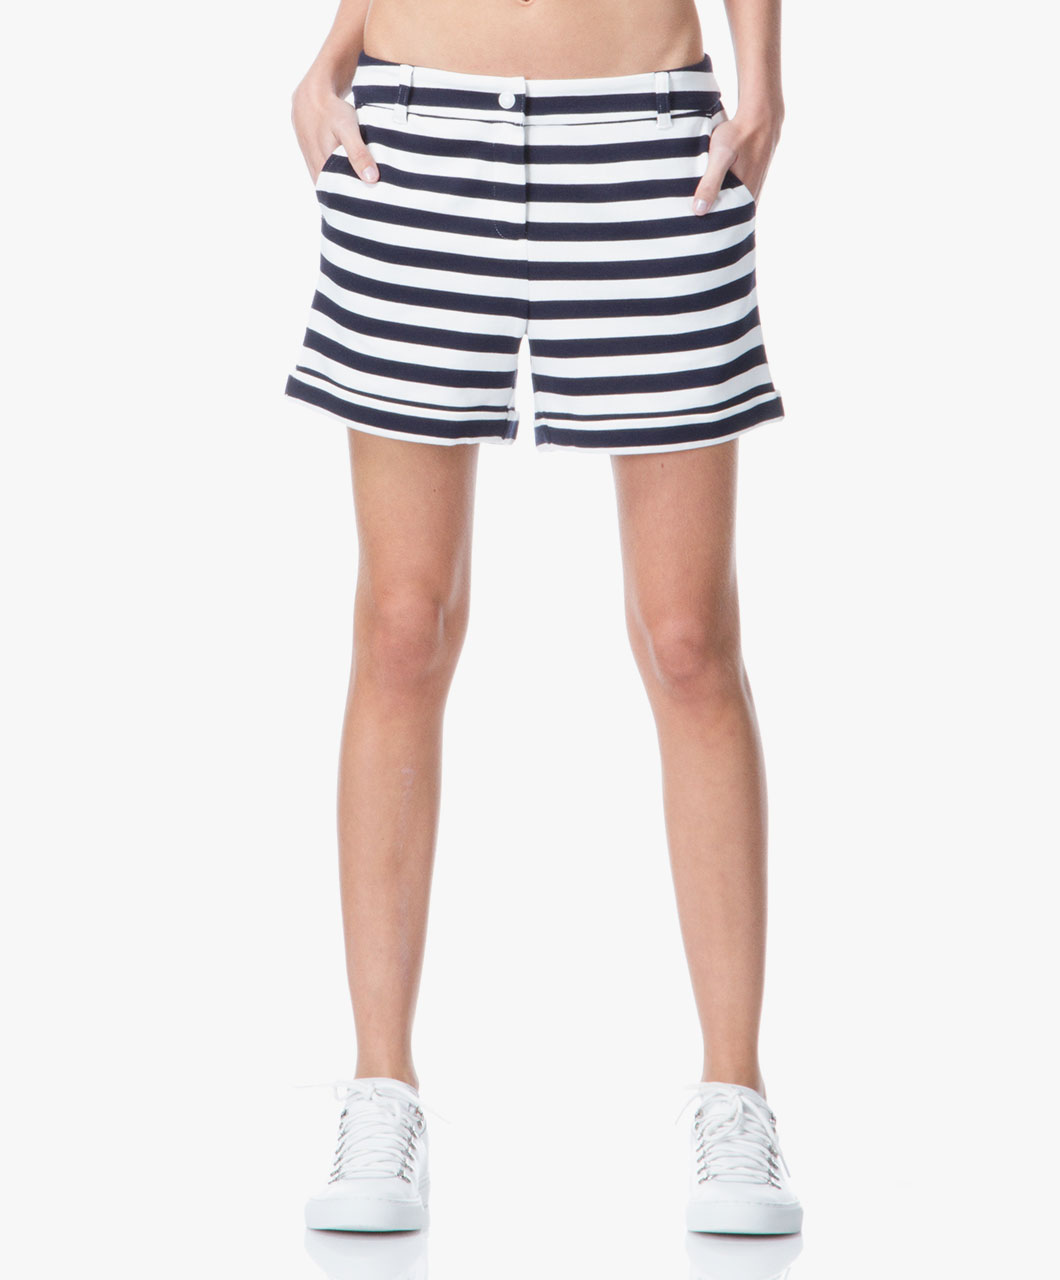 Petit Bateau Jersey Striped Shorts - Navy/White - Petit Bateau Women